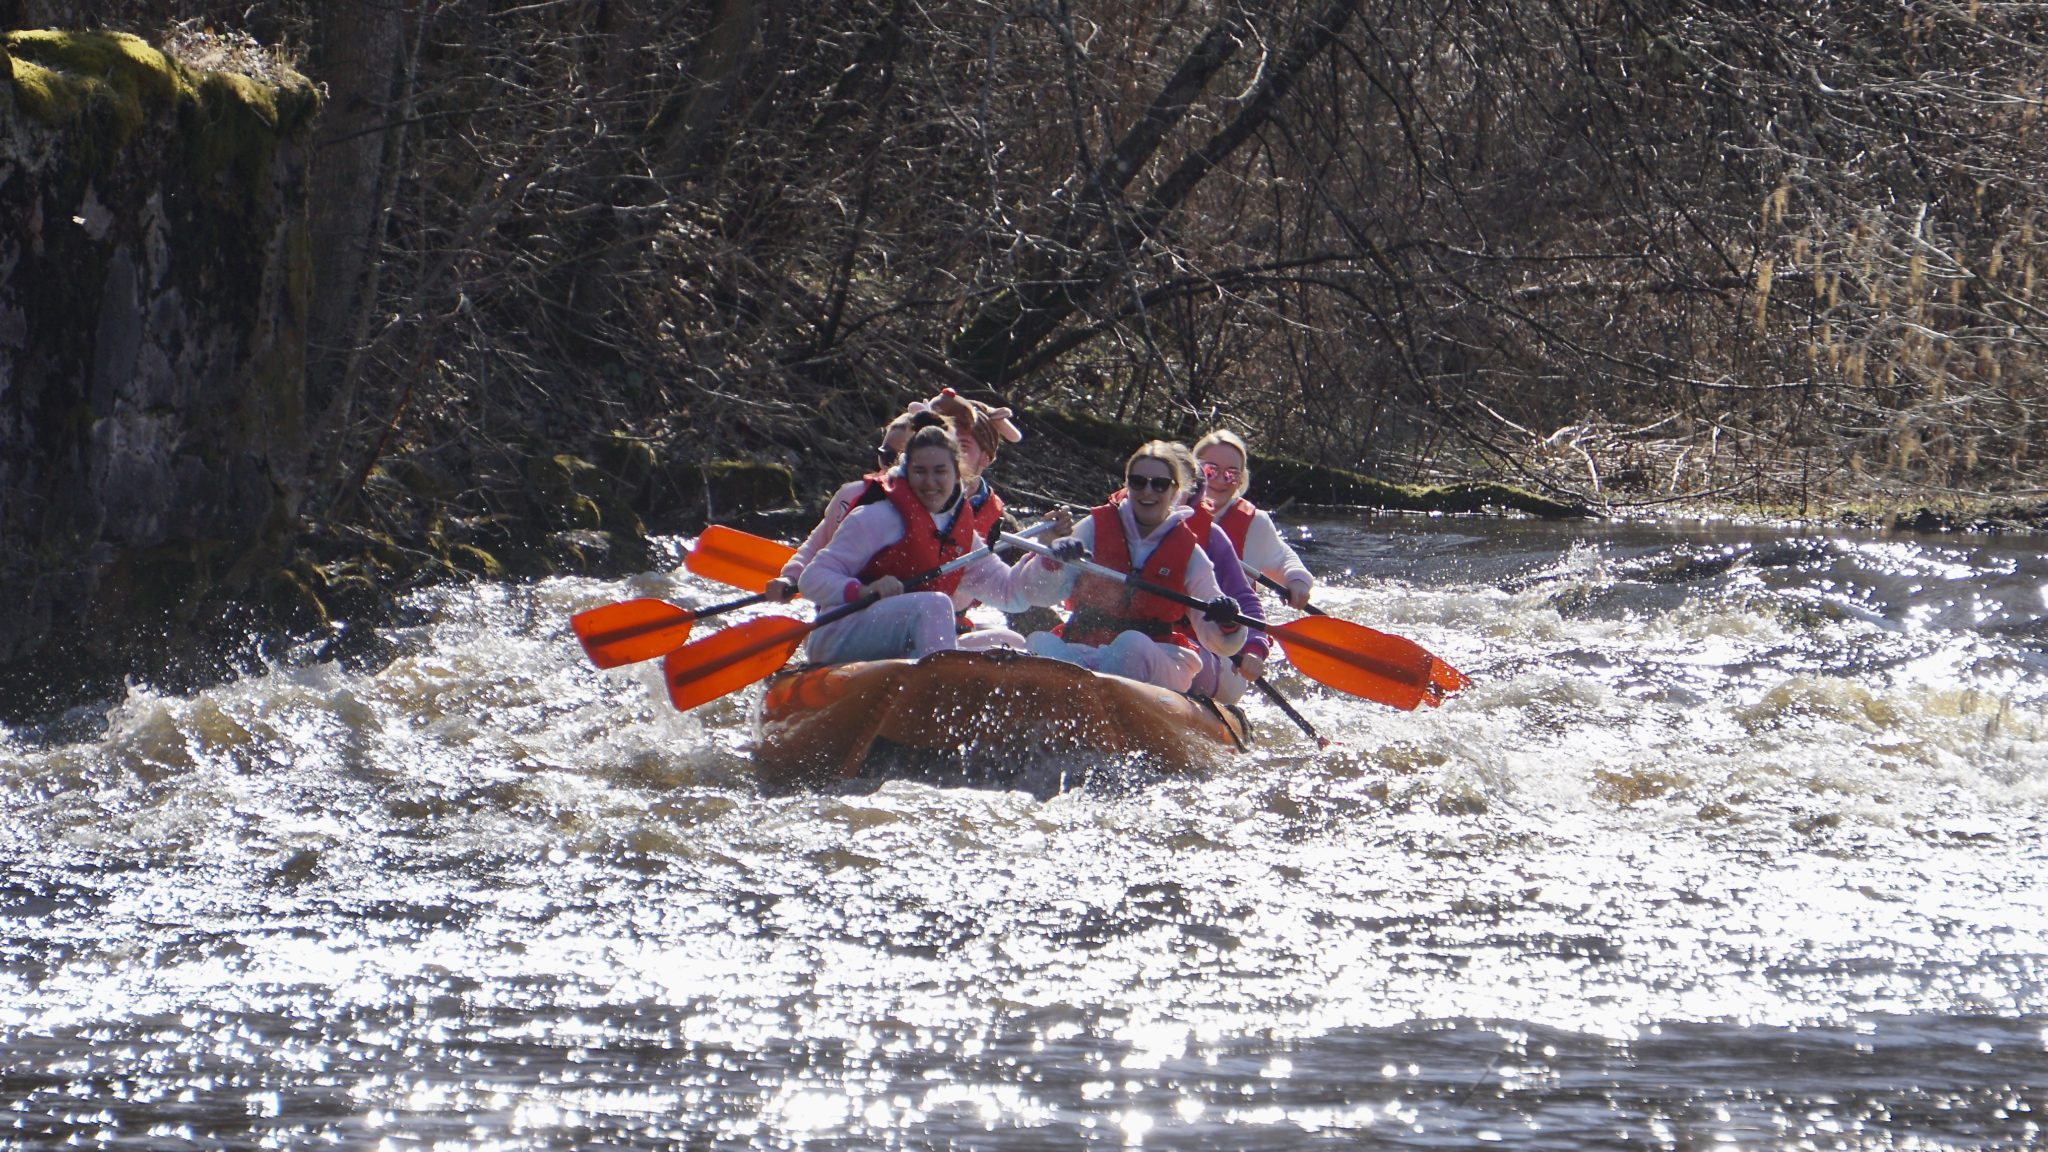 Parvematk Rafting